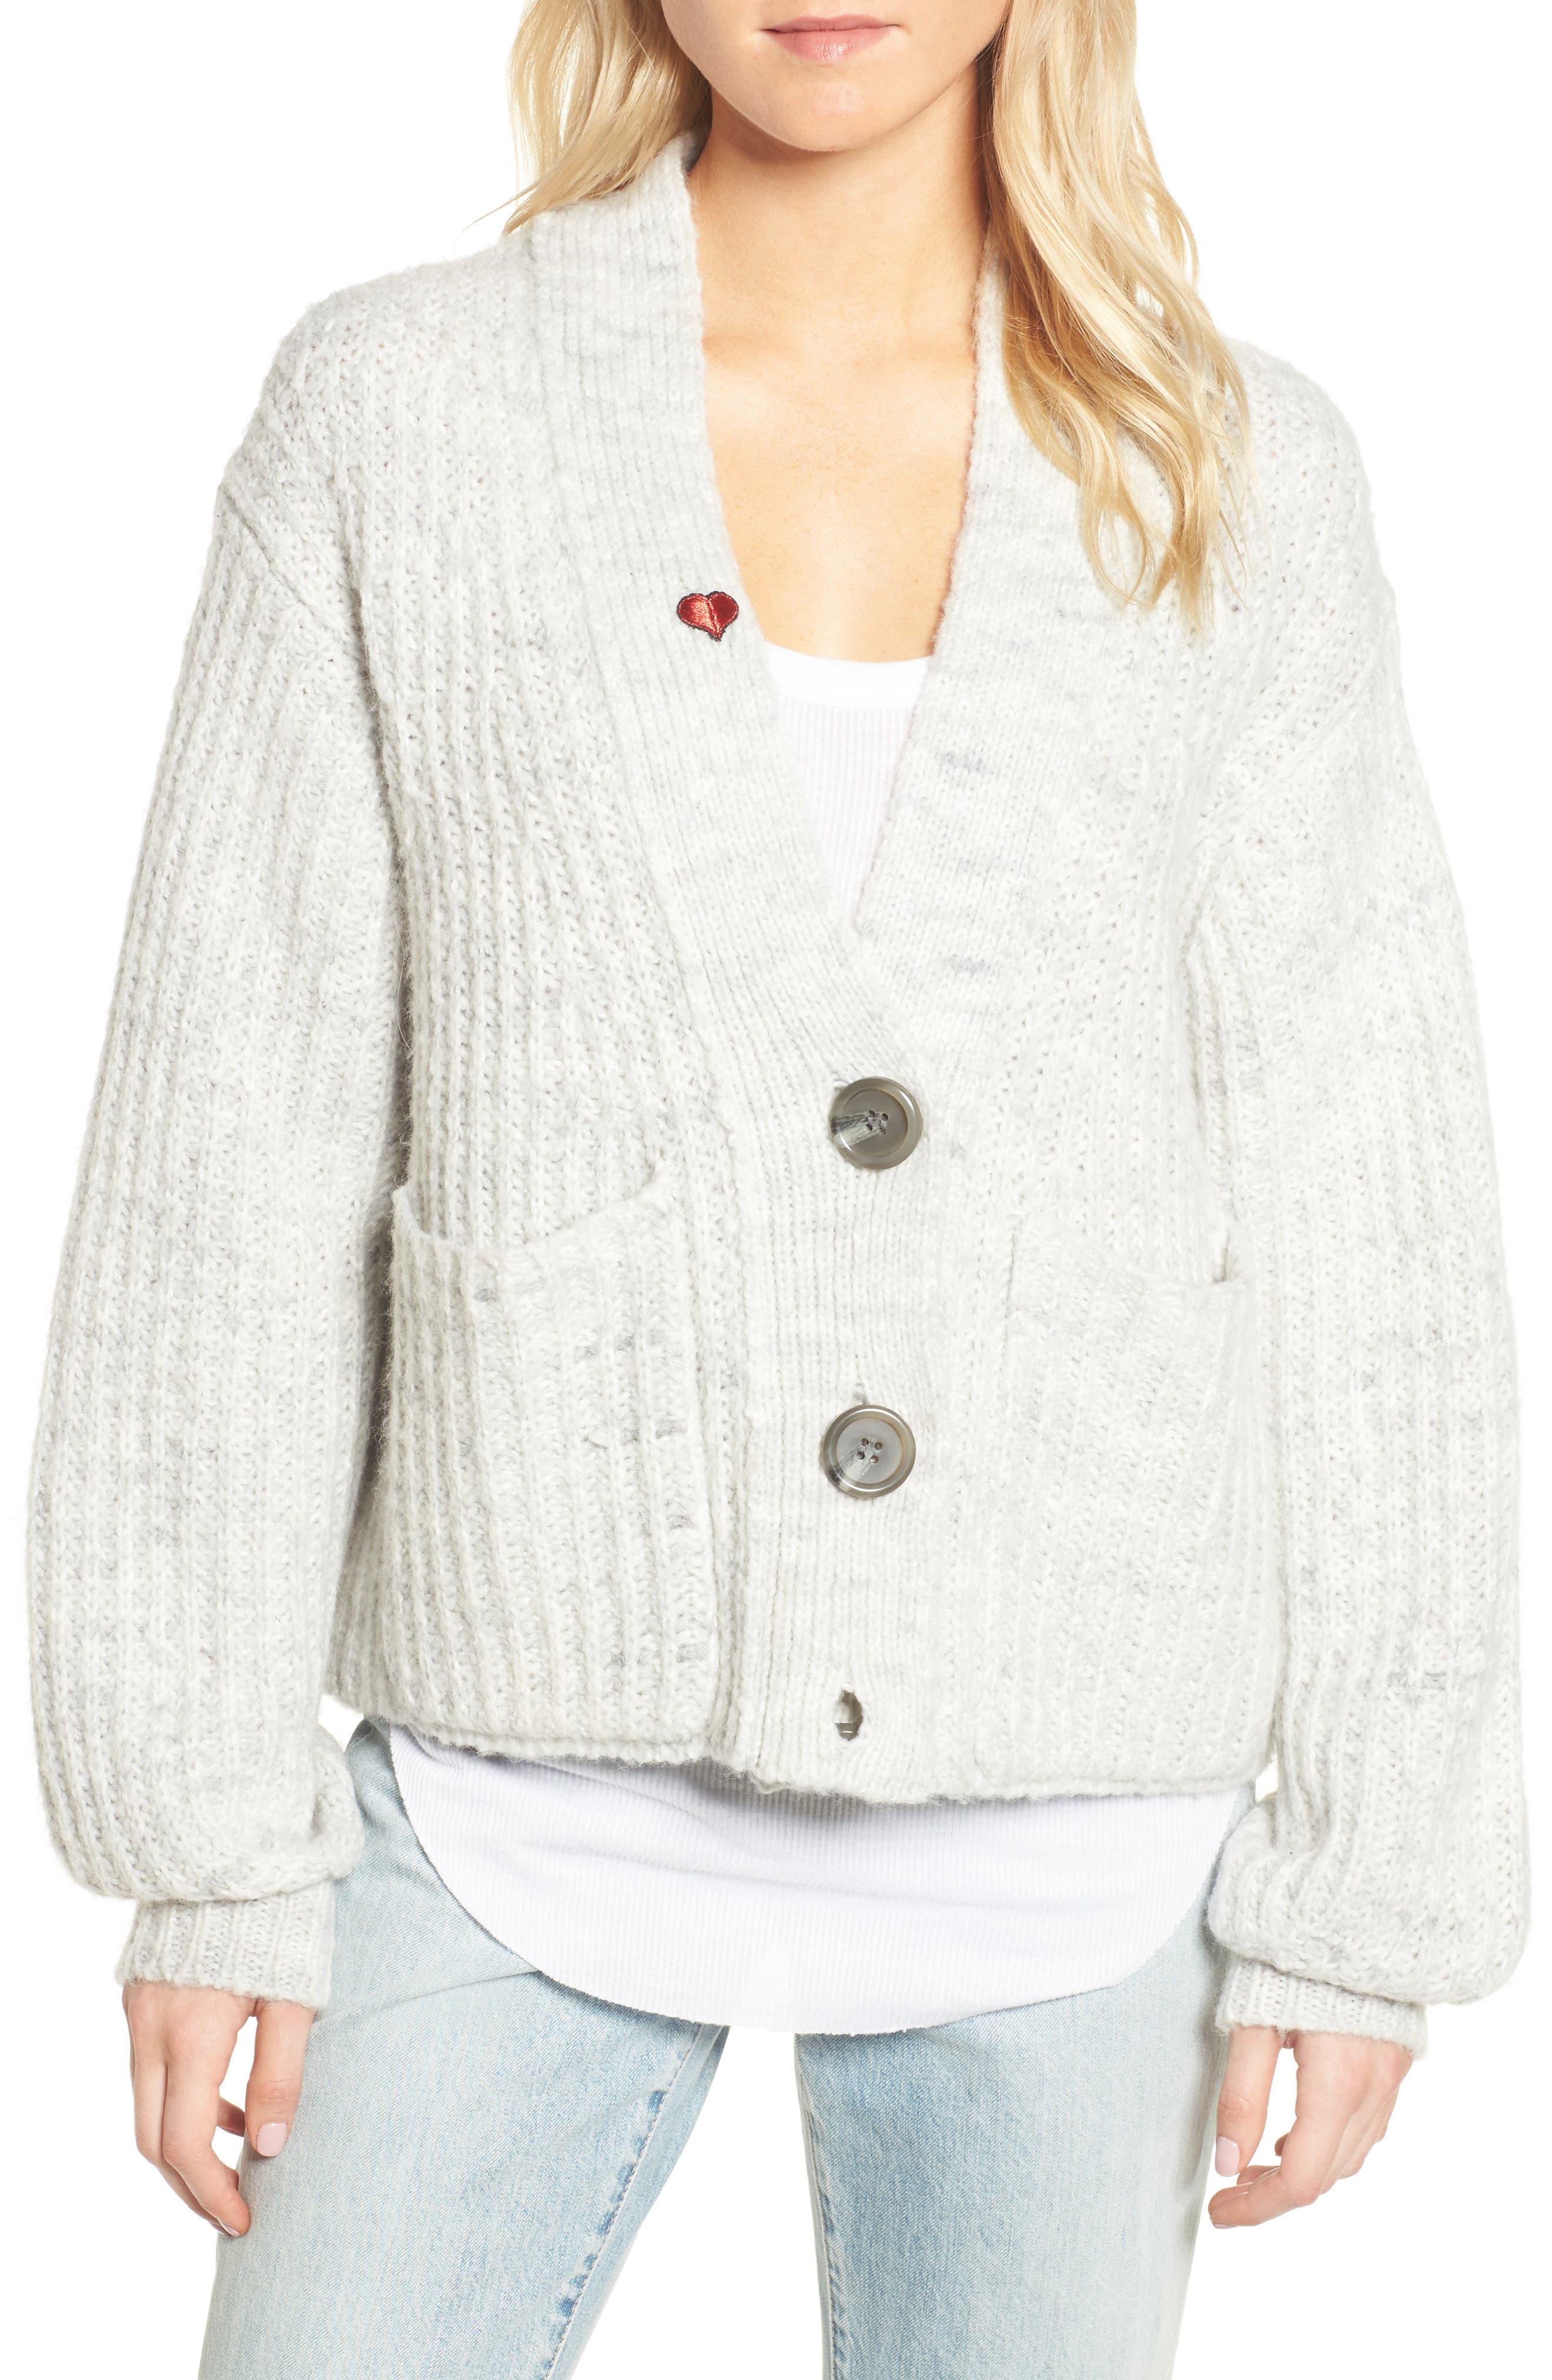 Alternate Image 1 Selected - Pam & Gela Oversize Cardigan